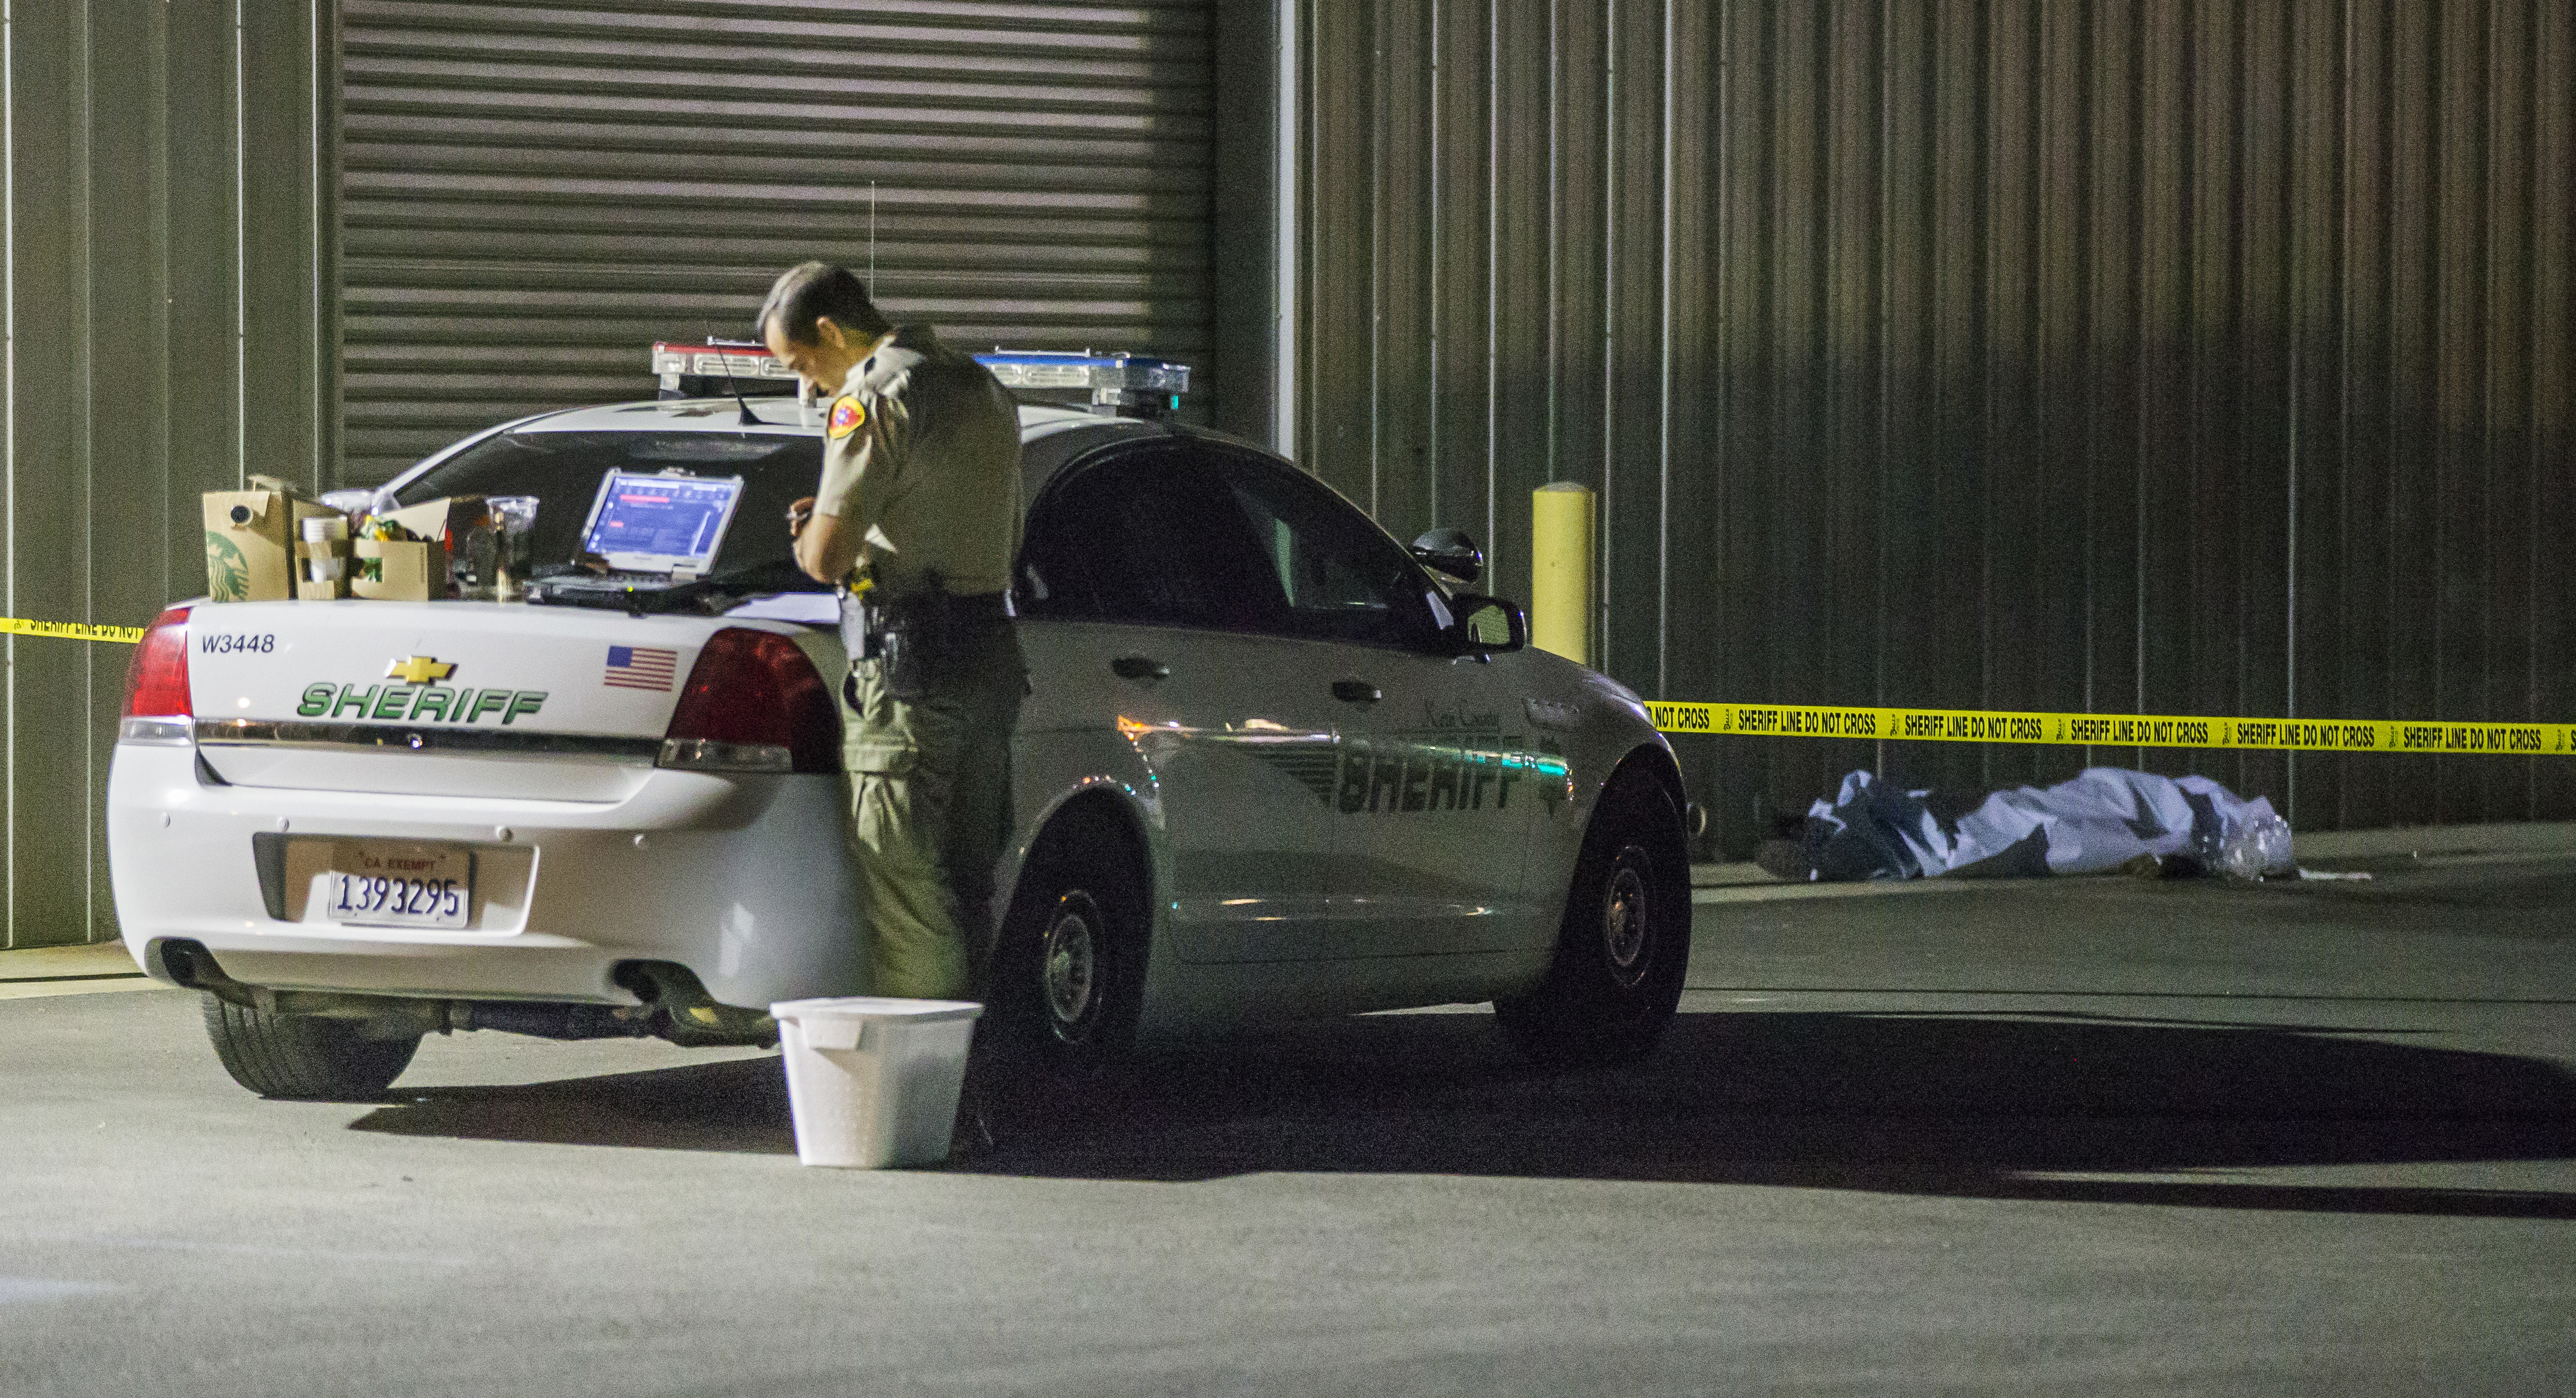 (Felix Adamo/The Bakersfield Californian via AP)